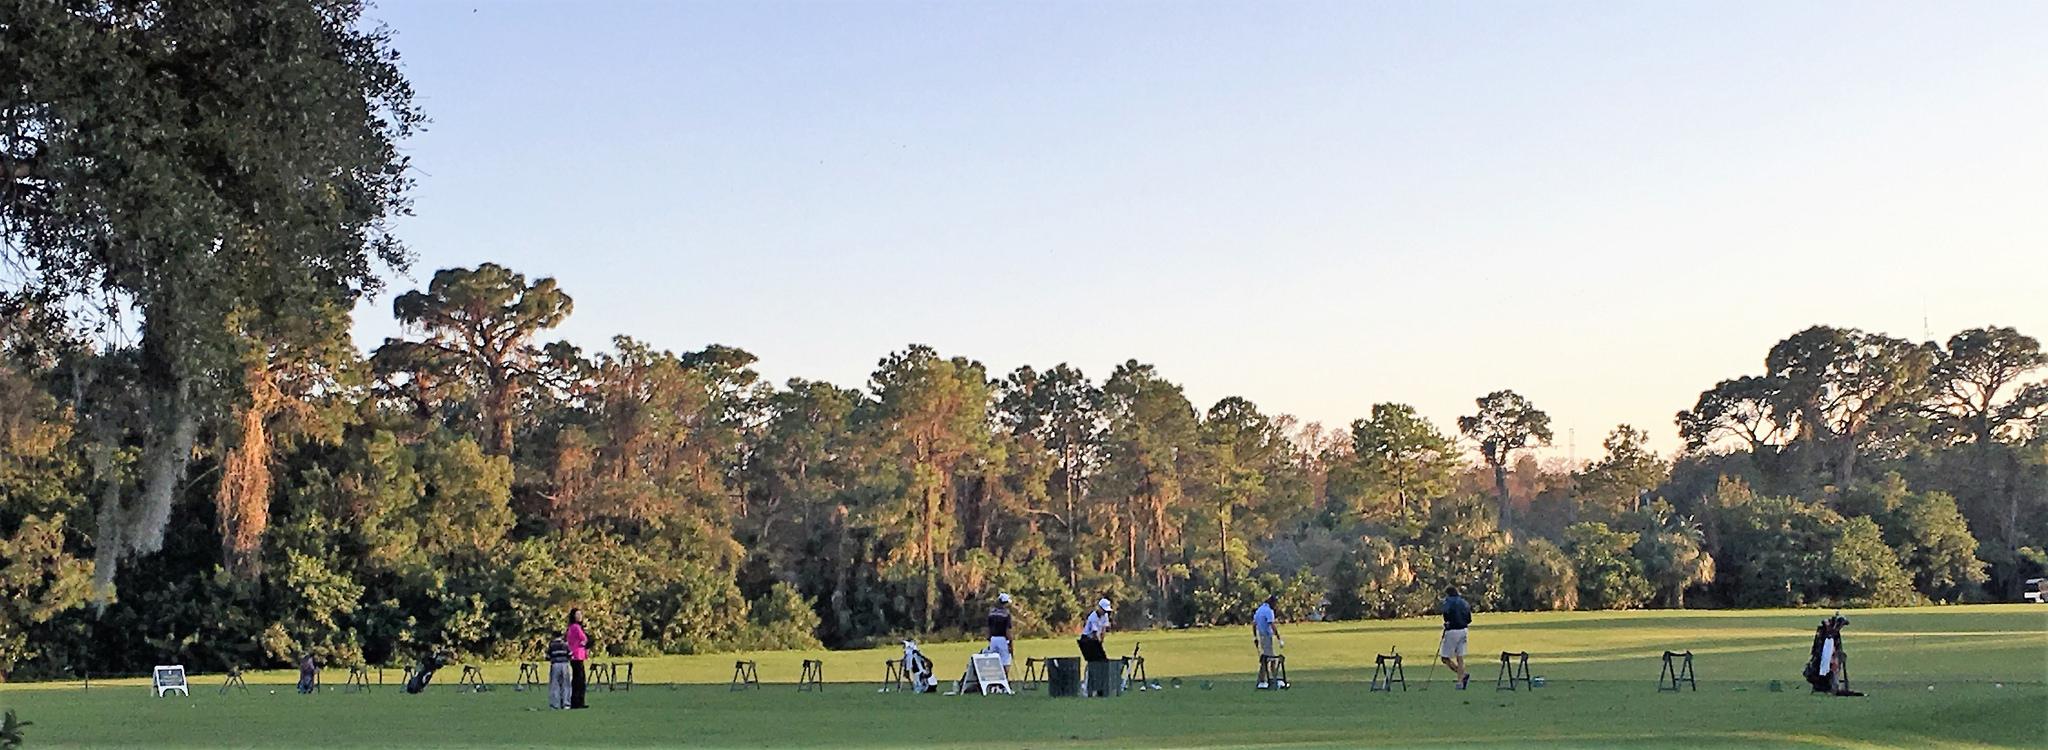 golf resorts in florida- innisbrook golf resort florida golf resort